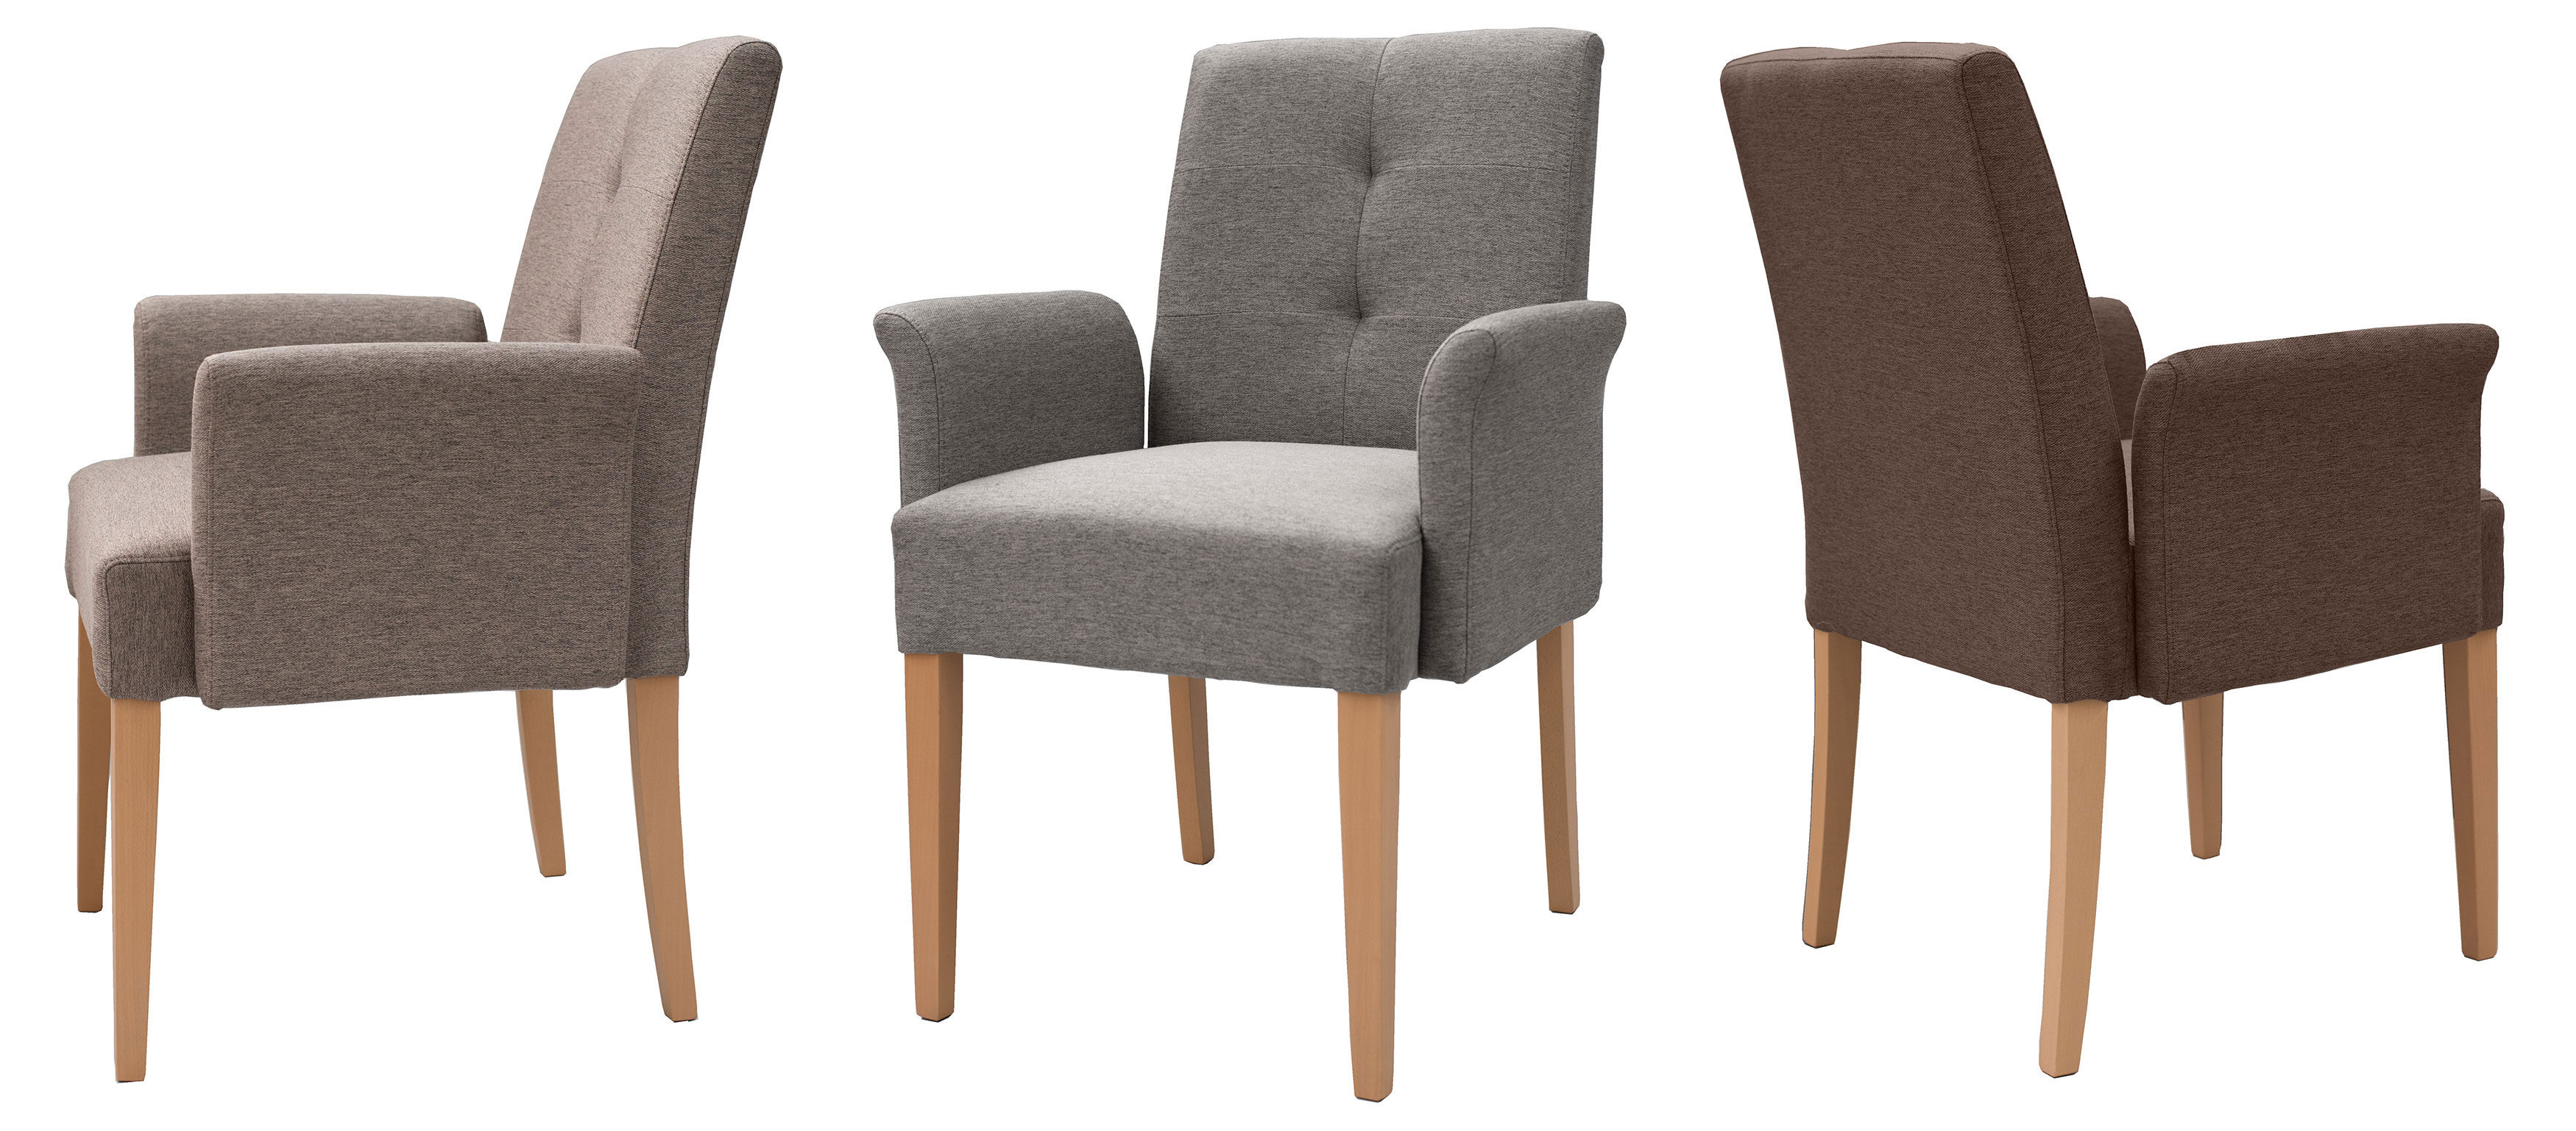 Standard Furniture Agra Stuhlsessel